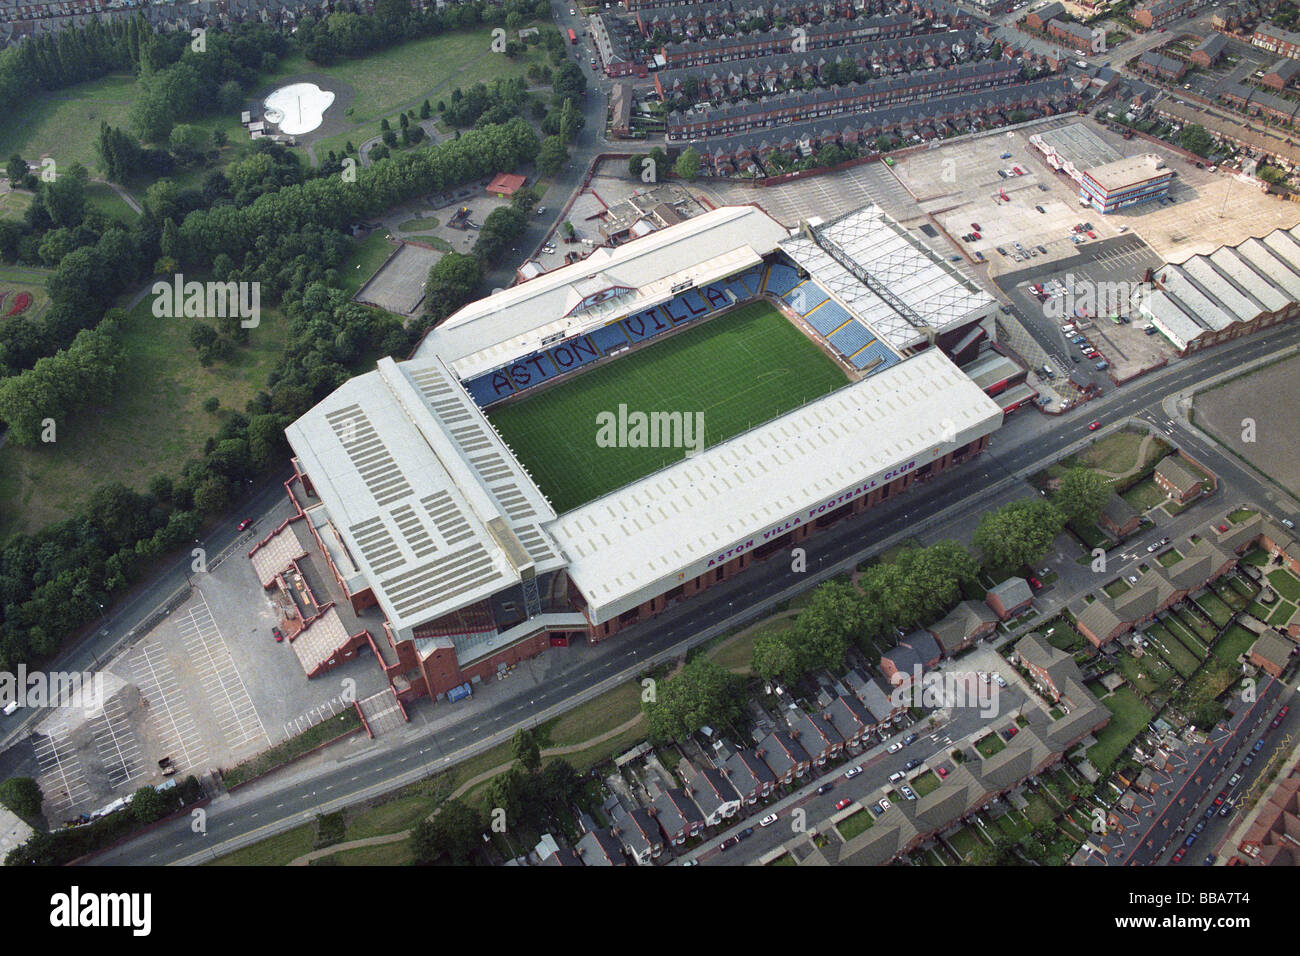 Aston Villa FC (England)